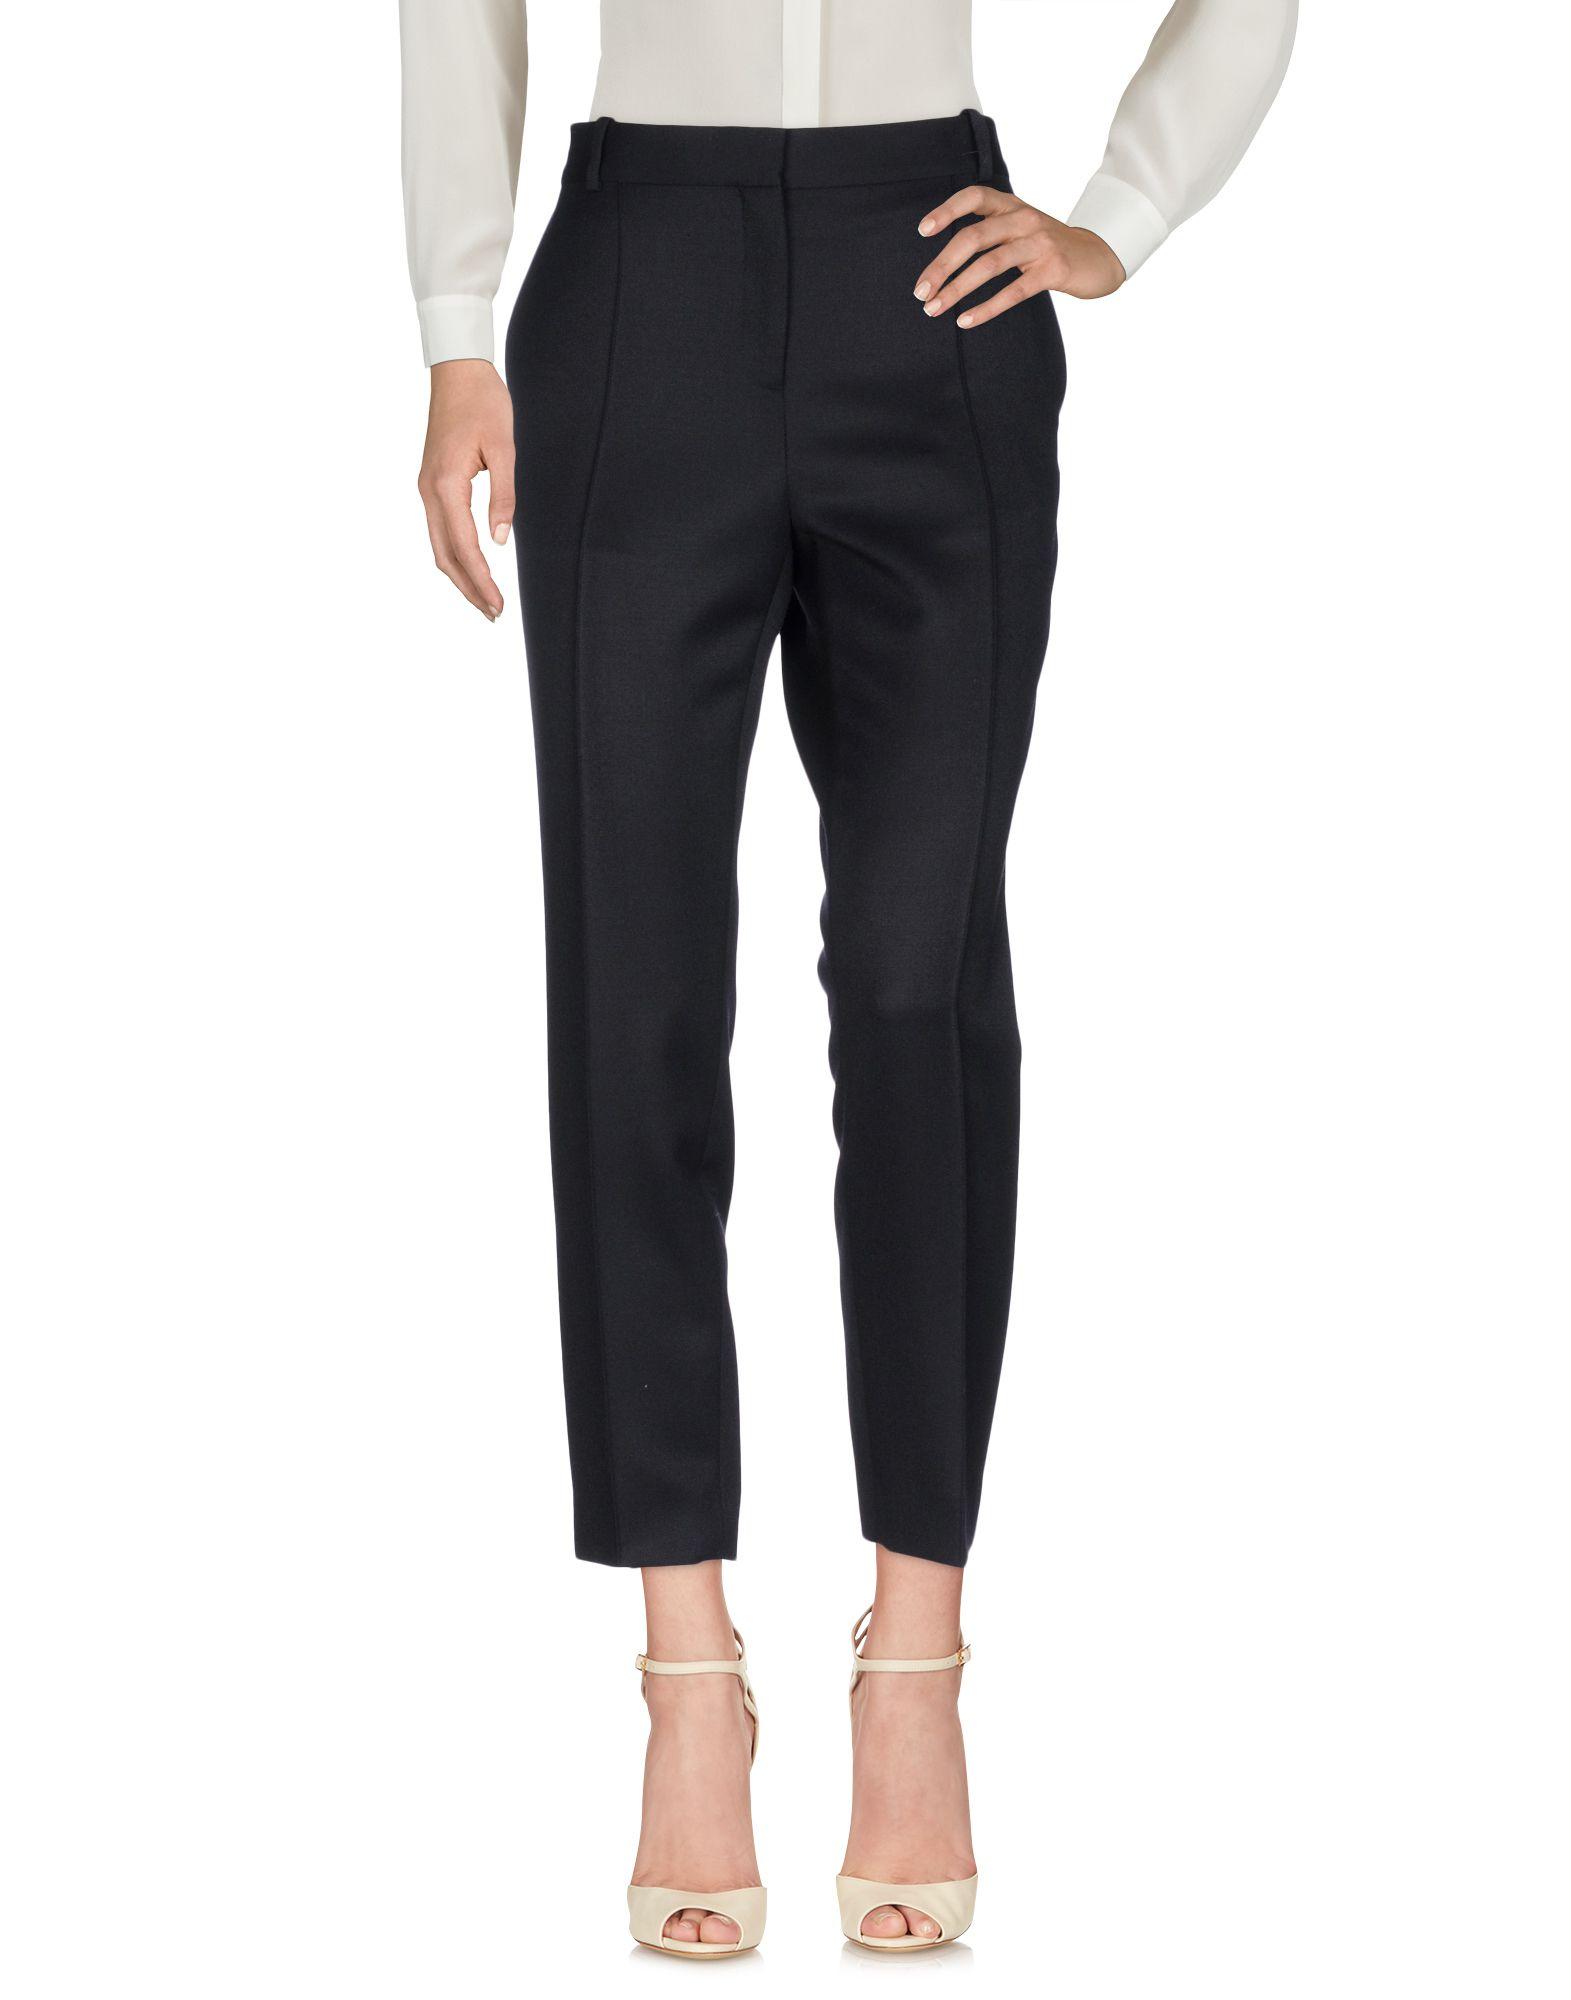 Pantalone Céline Donna - Acquista online su RWqg1iJsTO